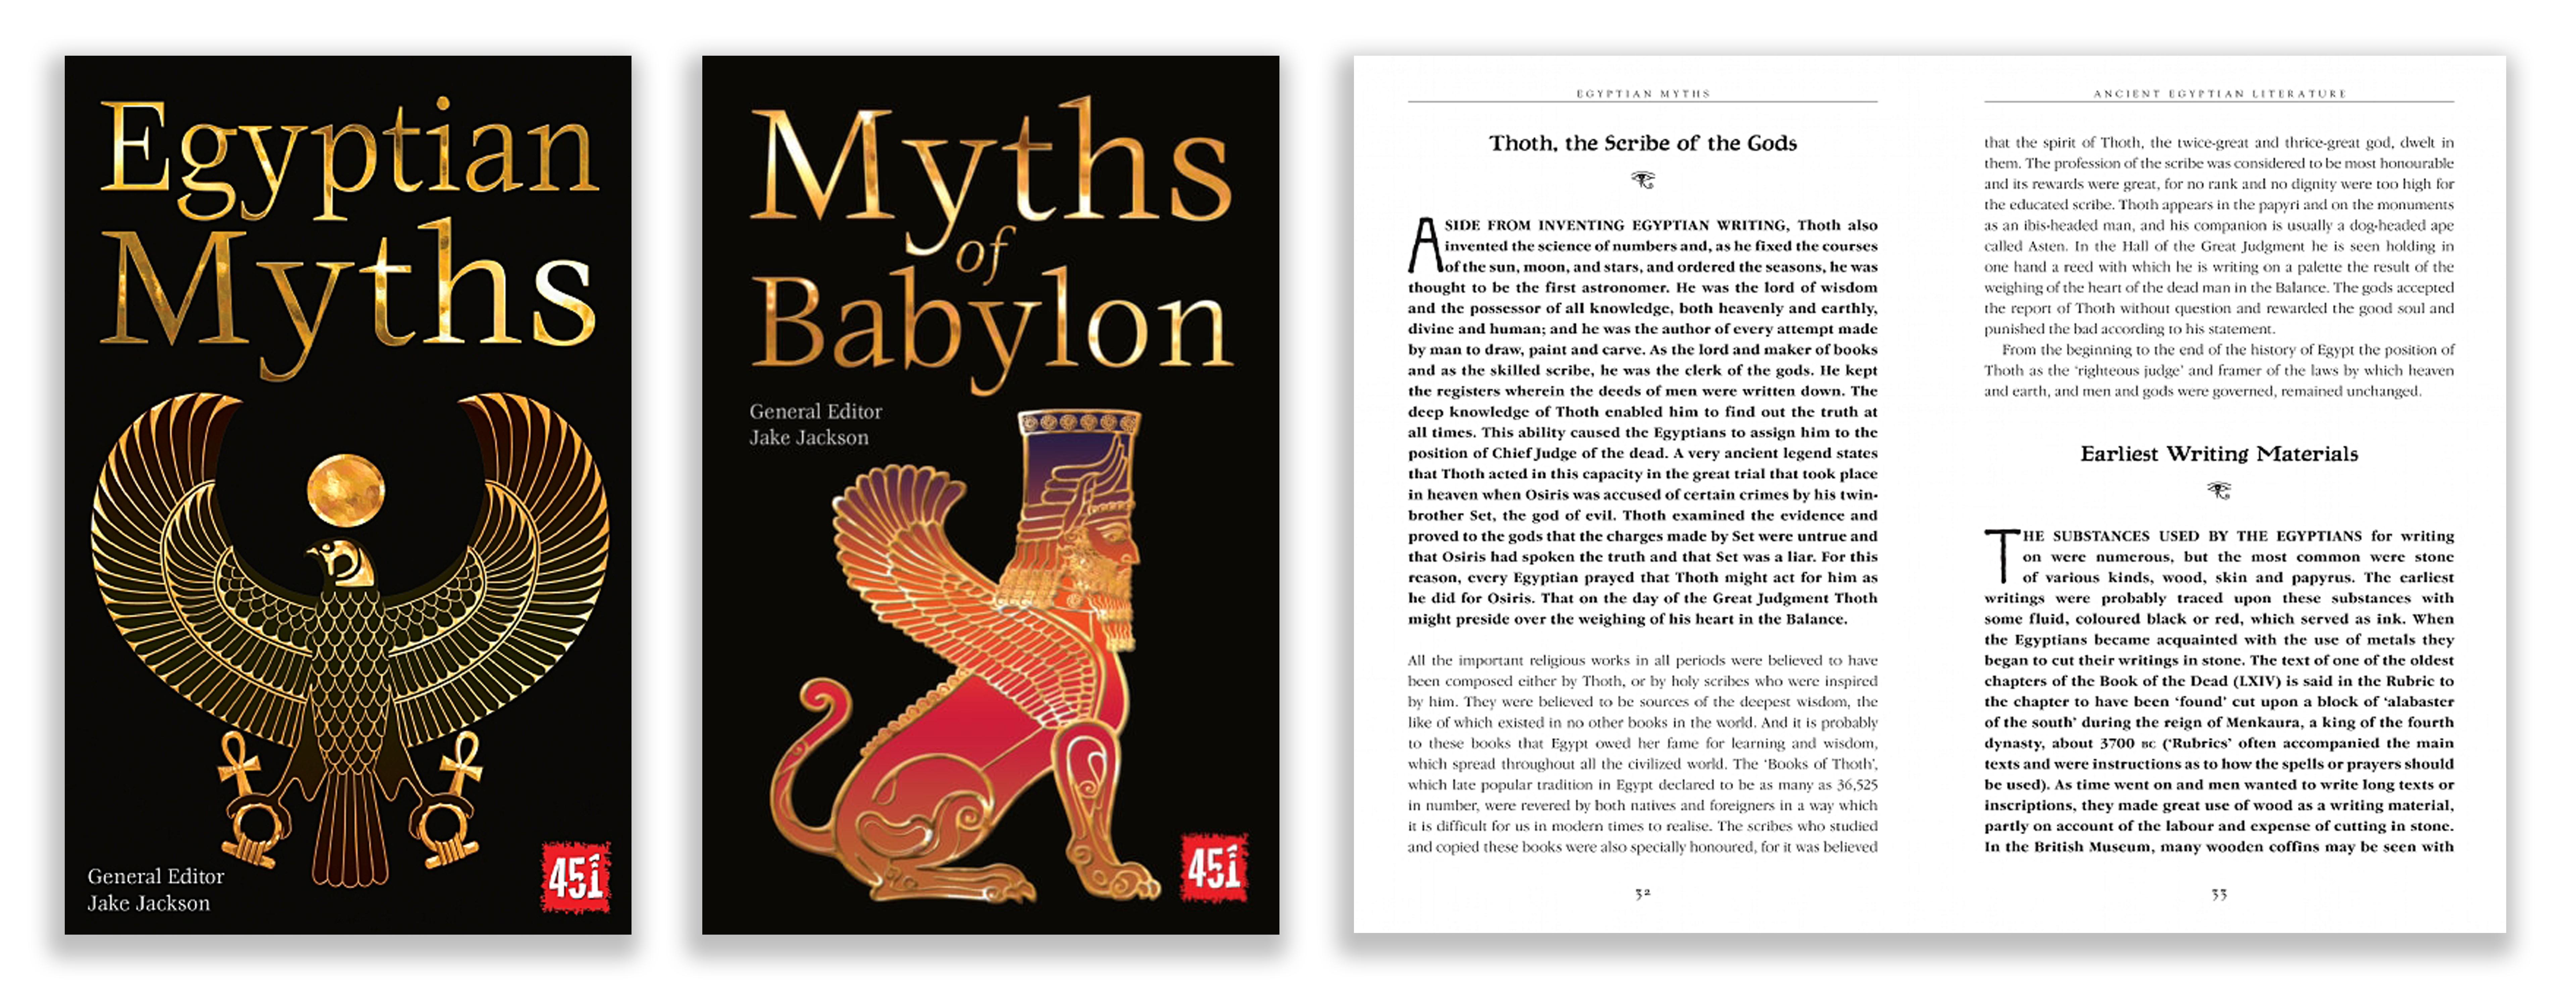 eygyptian myths-babylonian myths w- Spread